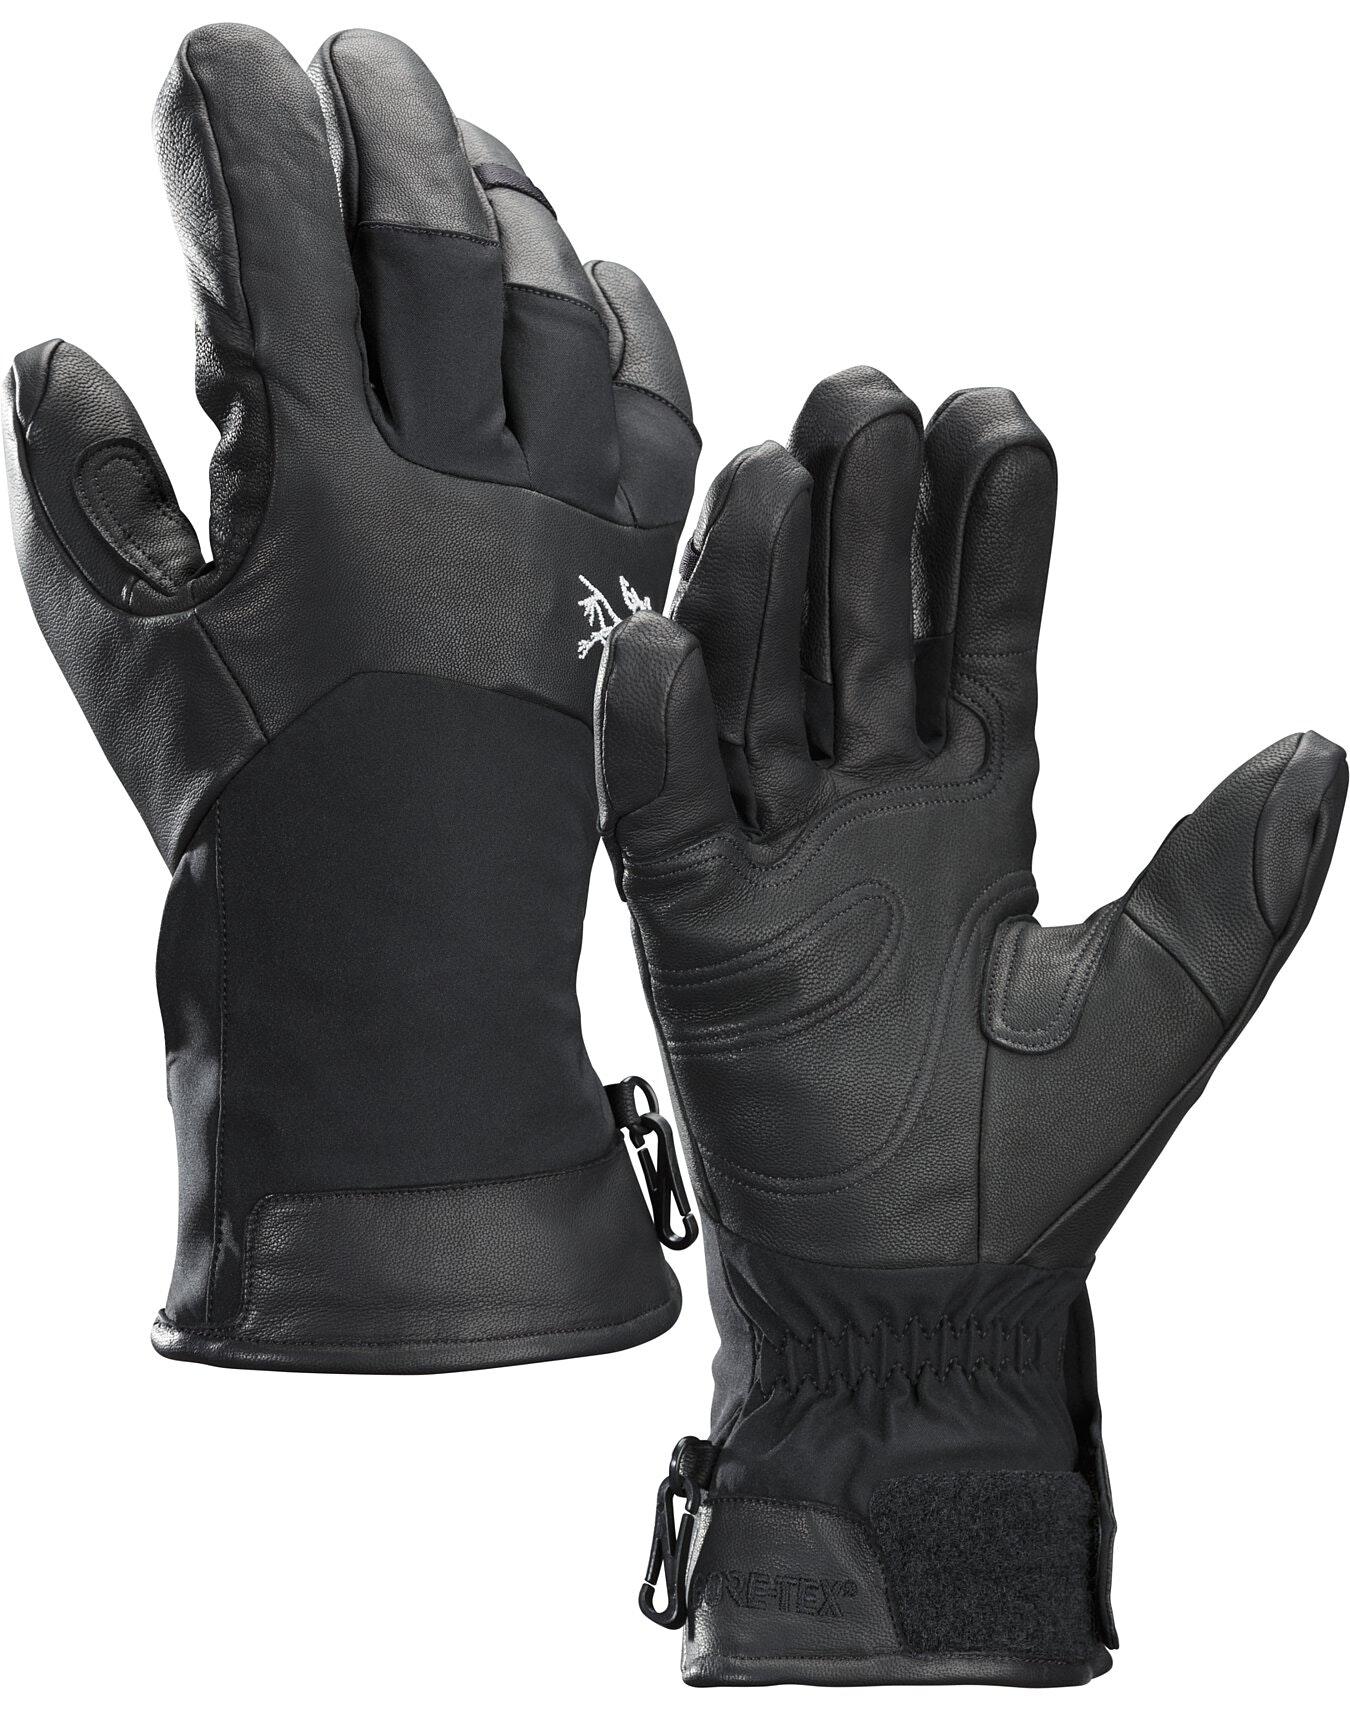 Sabre Glove Black